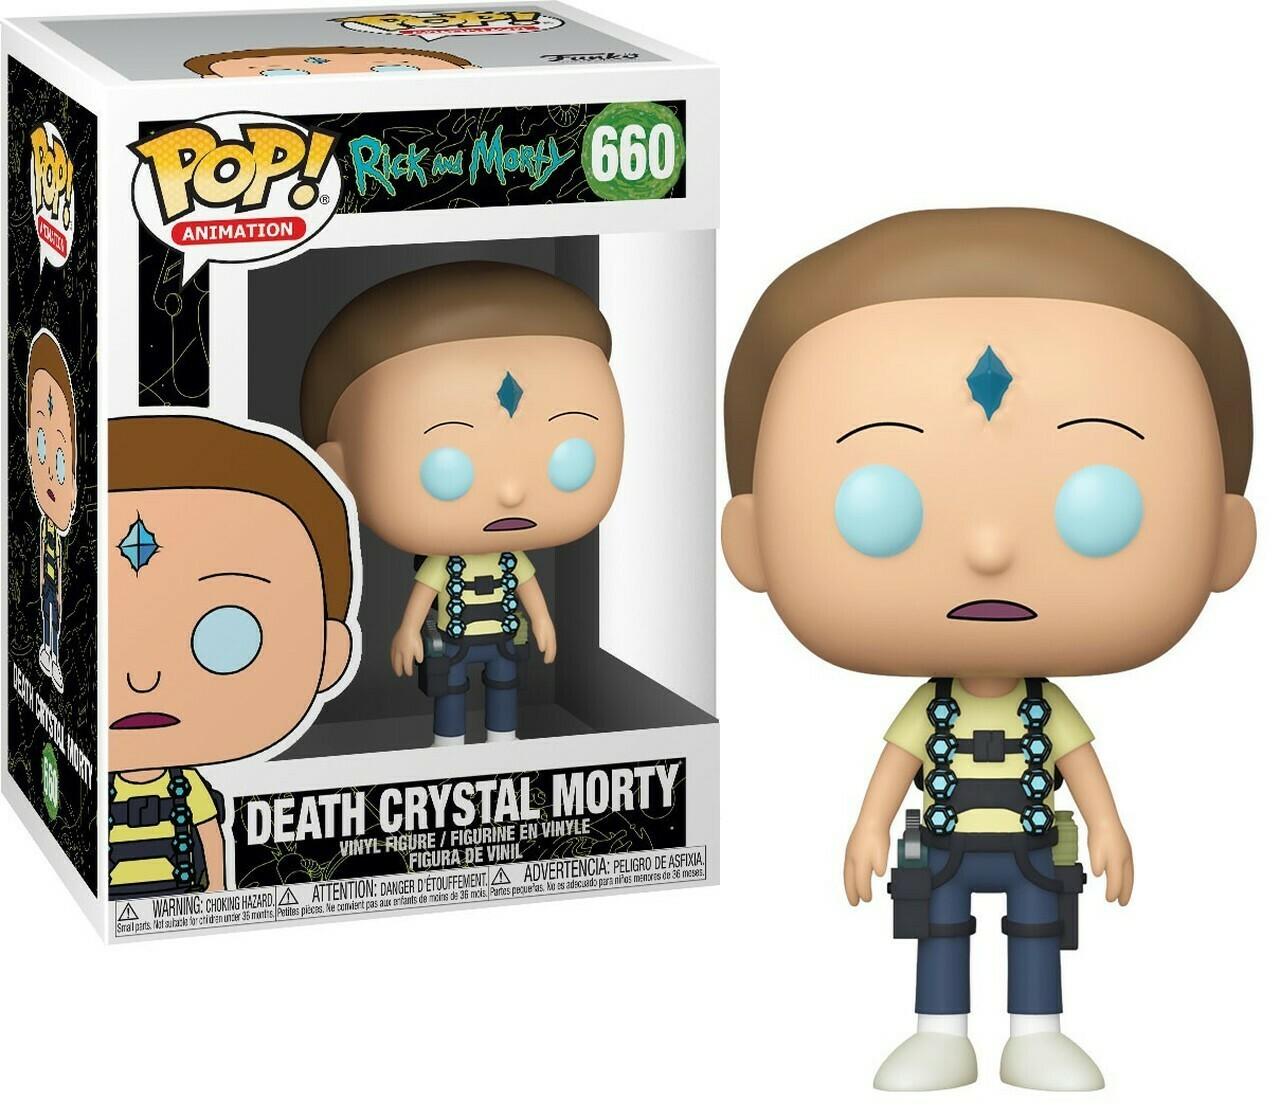 Death Crystal Morty